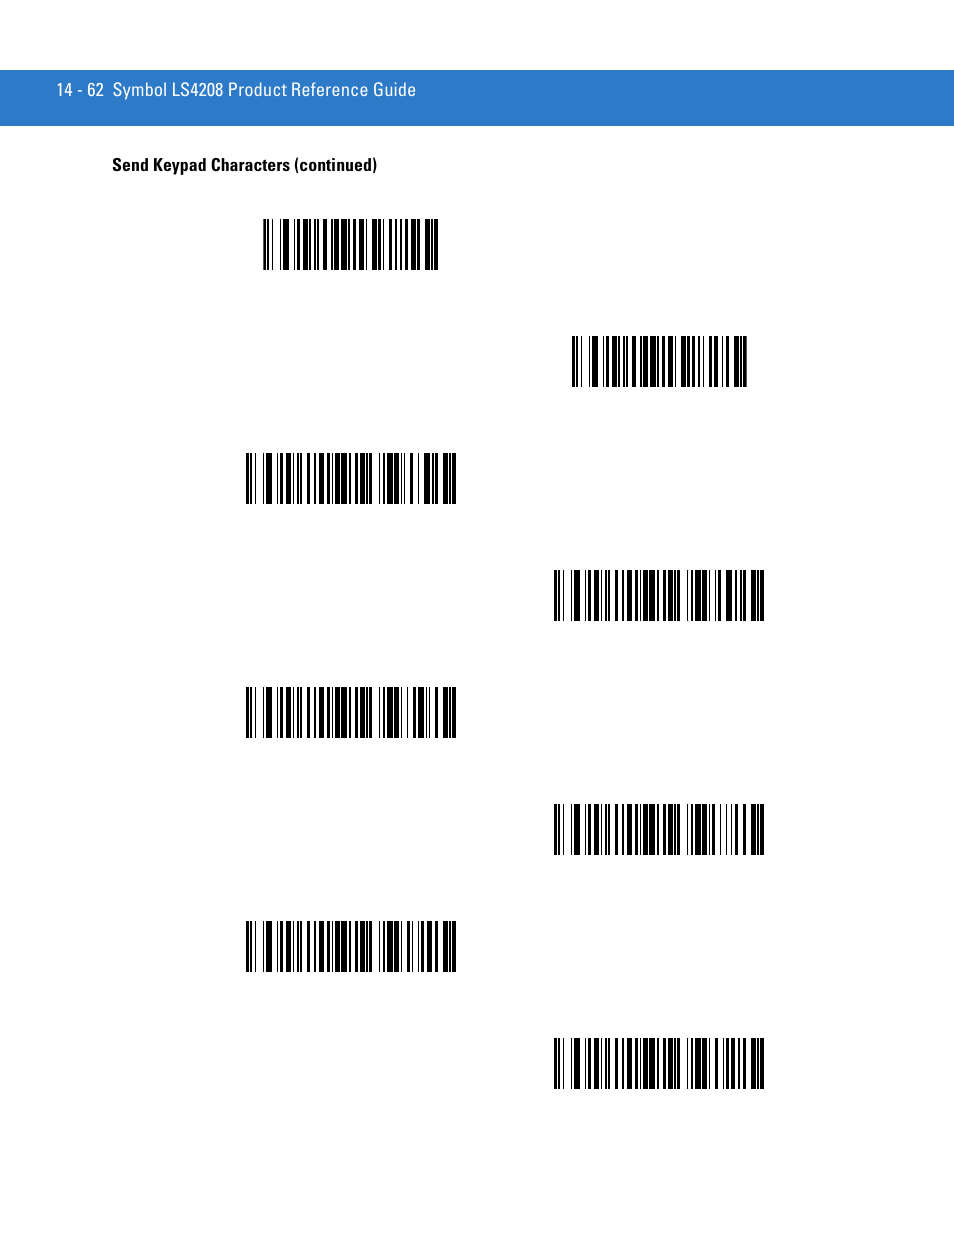 motorola ls4208 user manual page 284 358 rh manualsdir com symbol ls4208 product reference guide Symbol LS3578